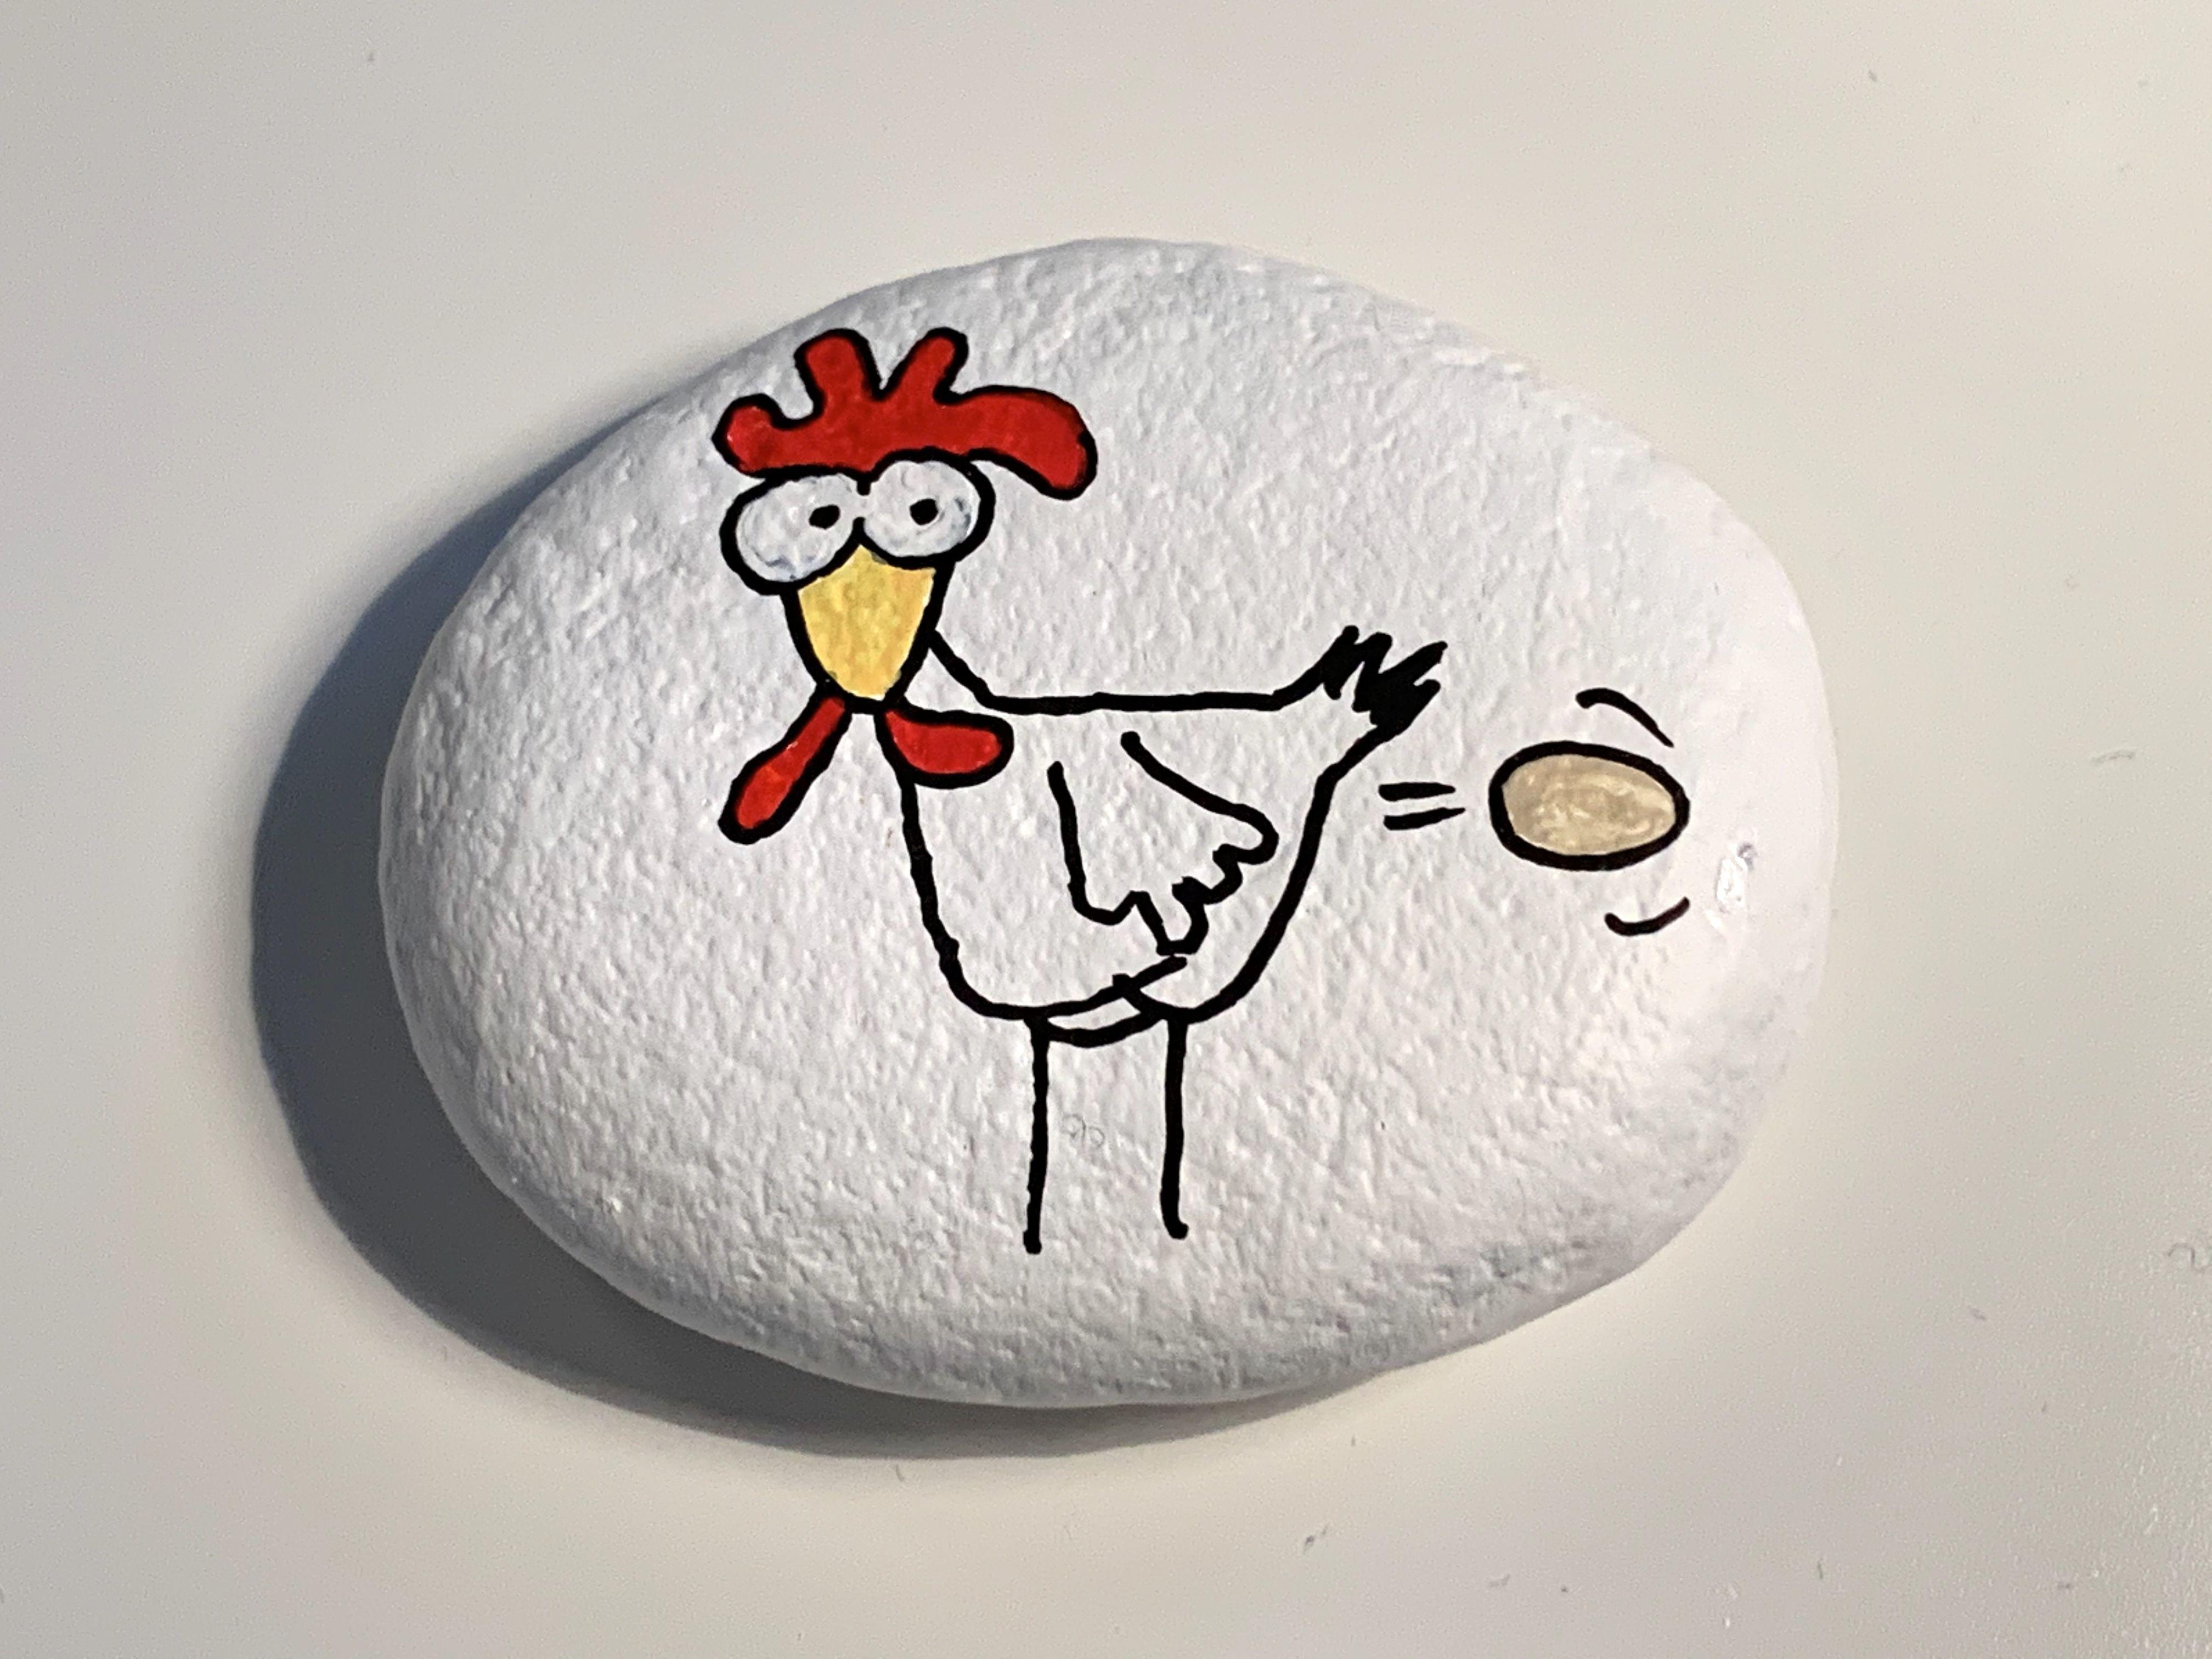 Steinmalerei - Rockart - Huhn